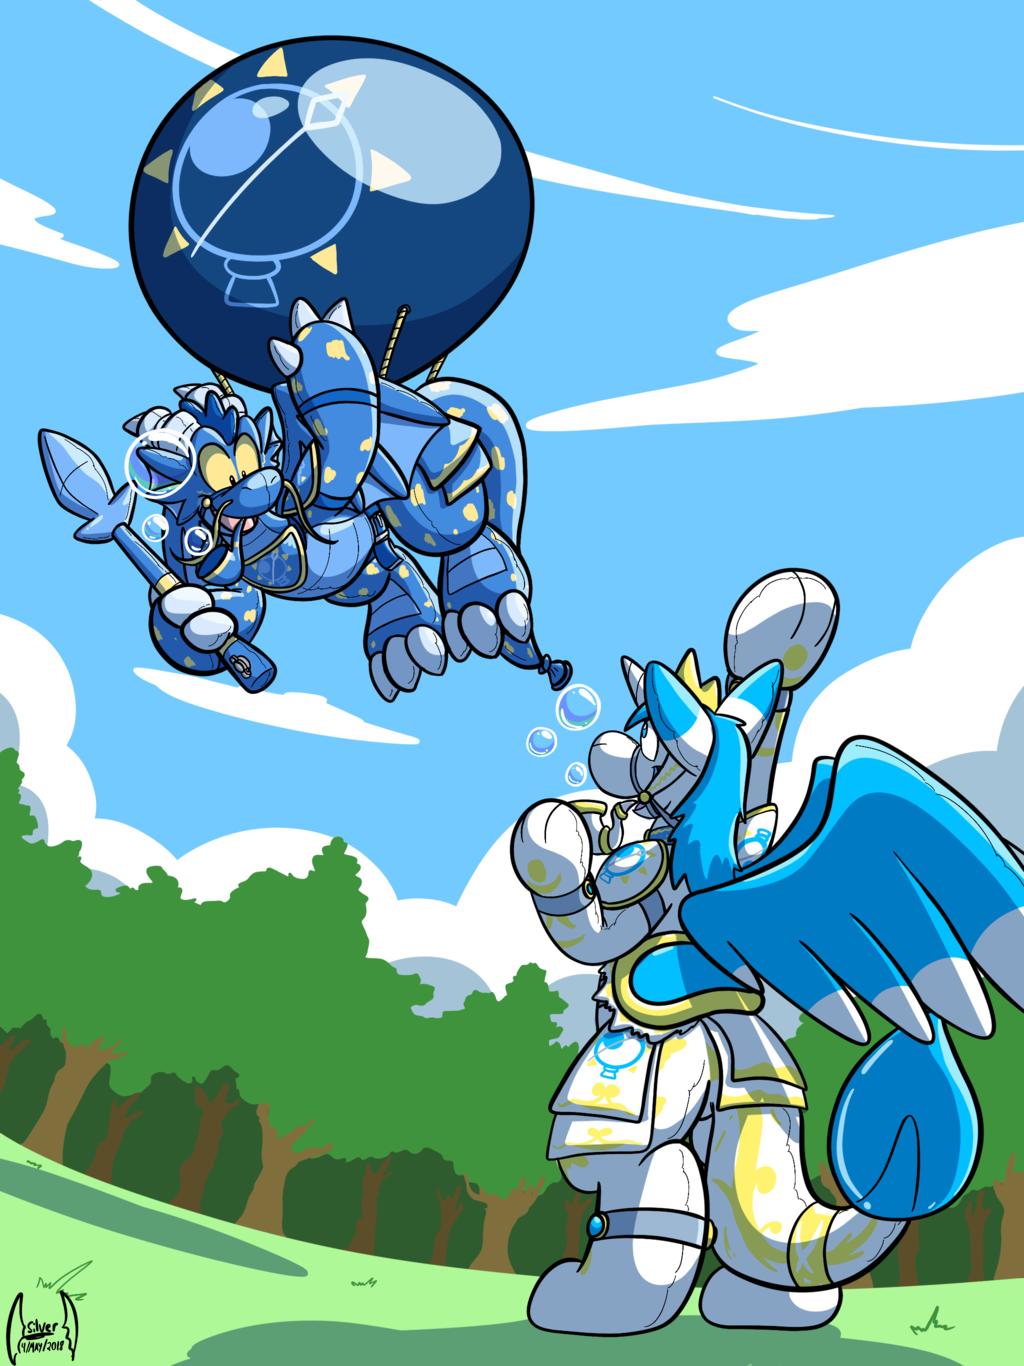 Curus Keel's Magical Balloon Journey (SoulSilver)